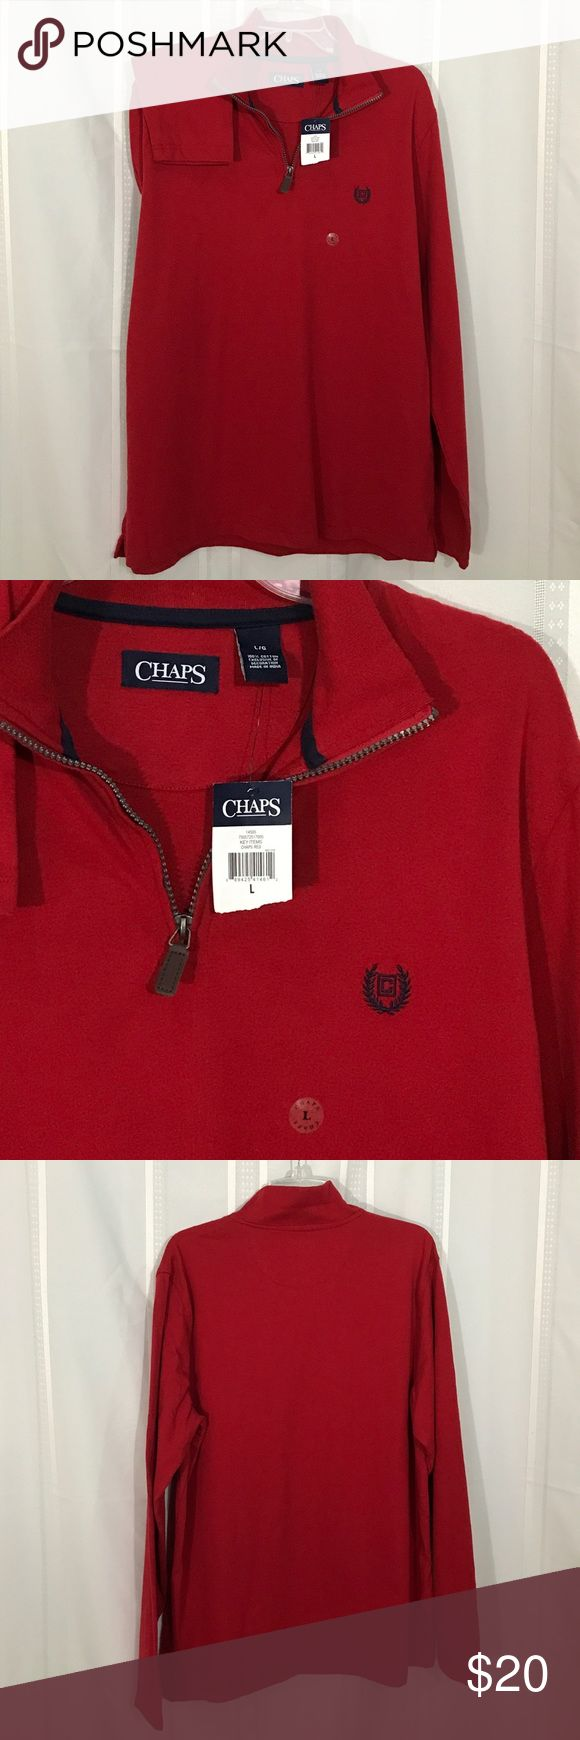 "CHAPS Red Pique LS Quarter Zip Polo Shirt (L) NWT red polo shirt has quarter zip front and Chaps logo. 100% cotton. Length 29-1/2"". Sleeve 34-3/4. Chaps Shirts Polos"